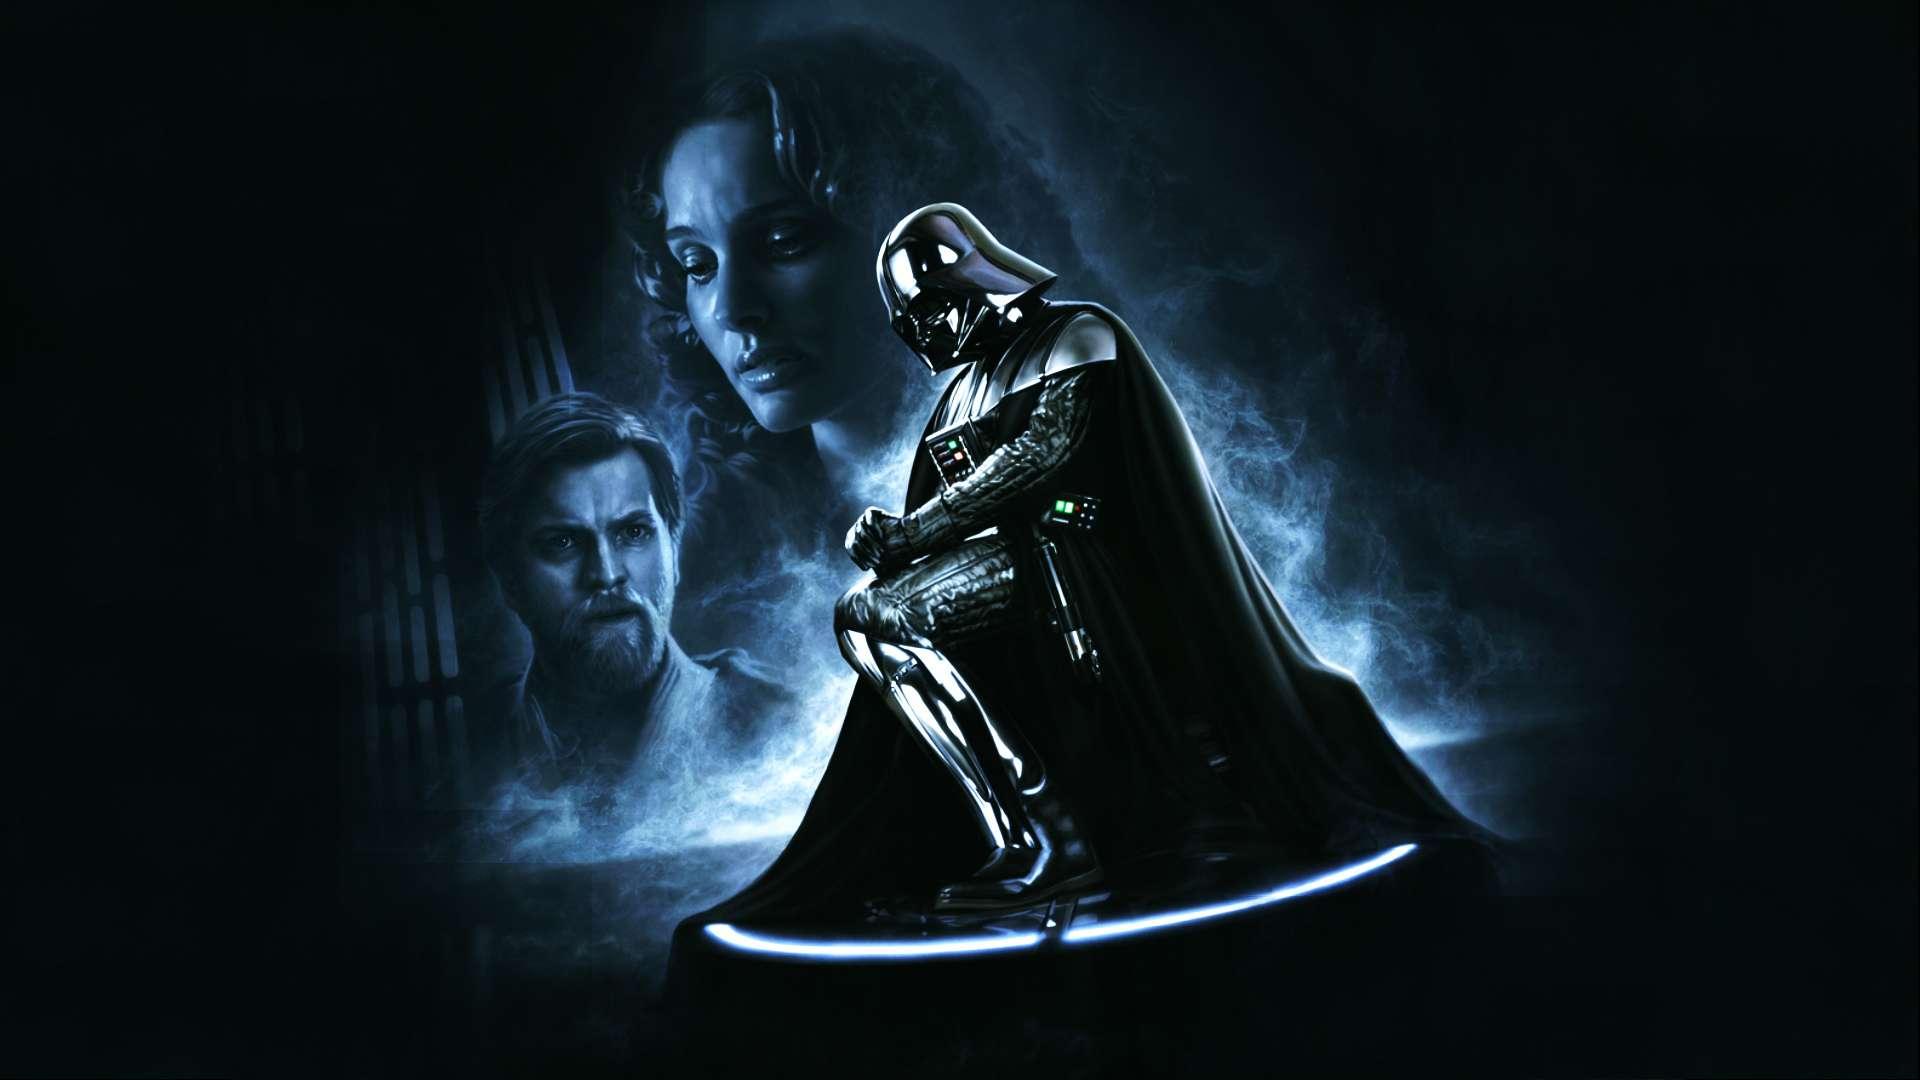 Star Wars Wallpaper 017